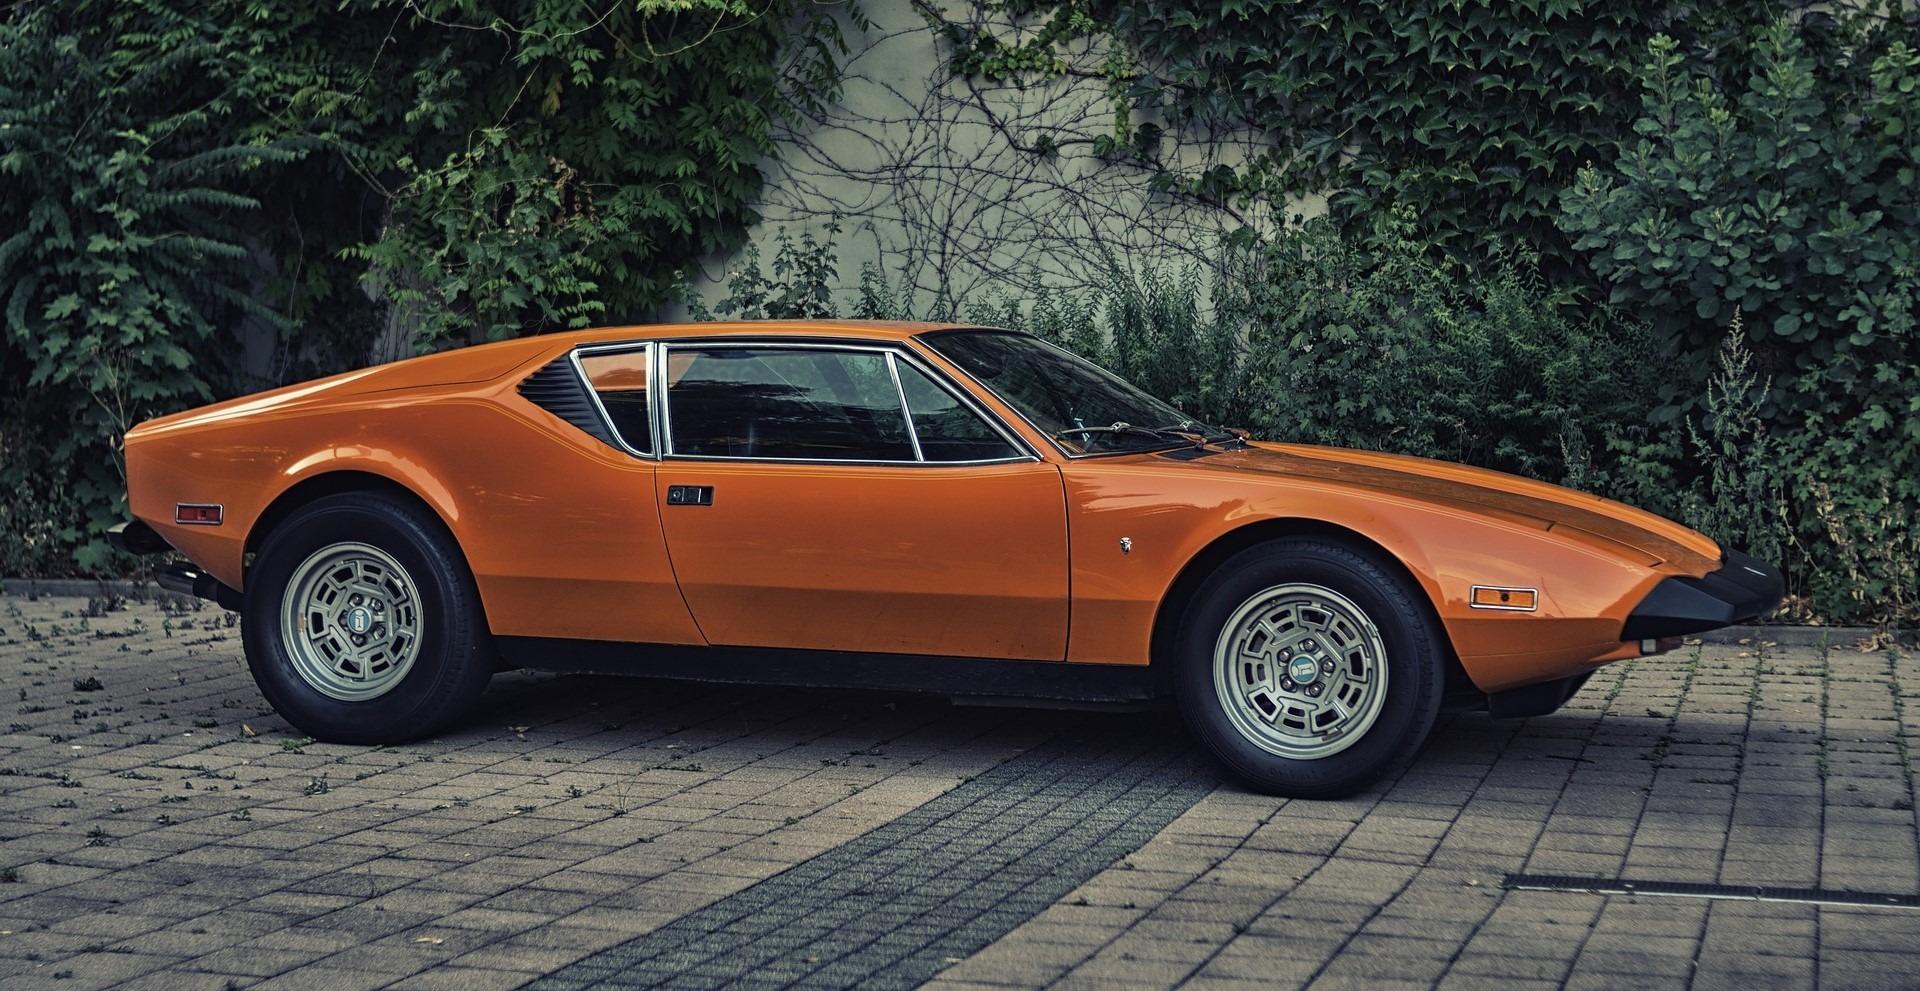 Orange Classic Vintage Car in Blaine, Minnesota - GoodwillCarDonation.org